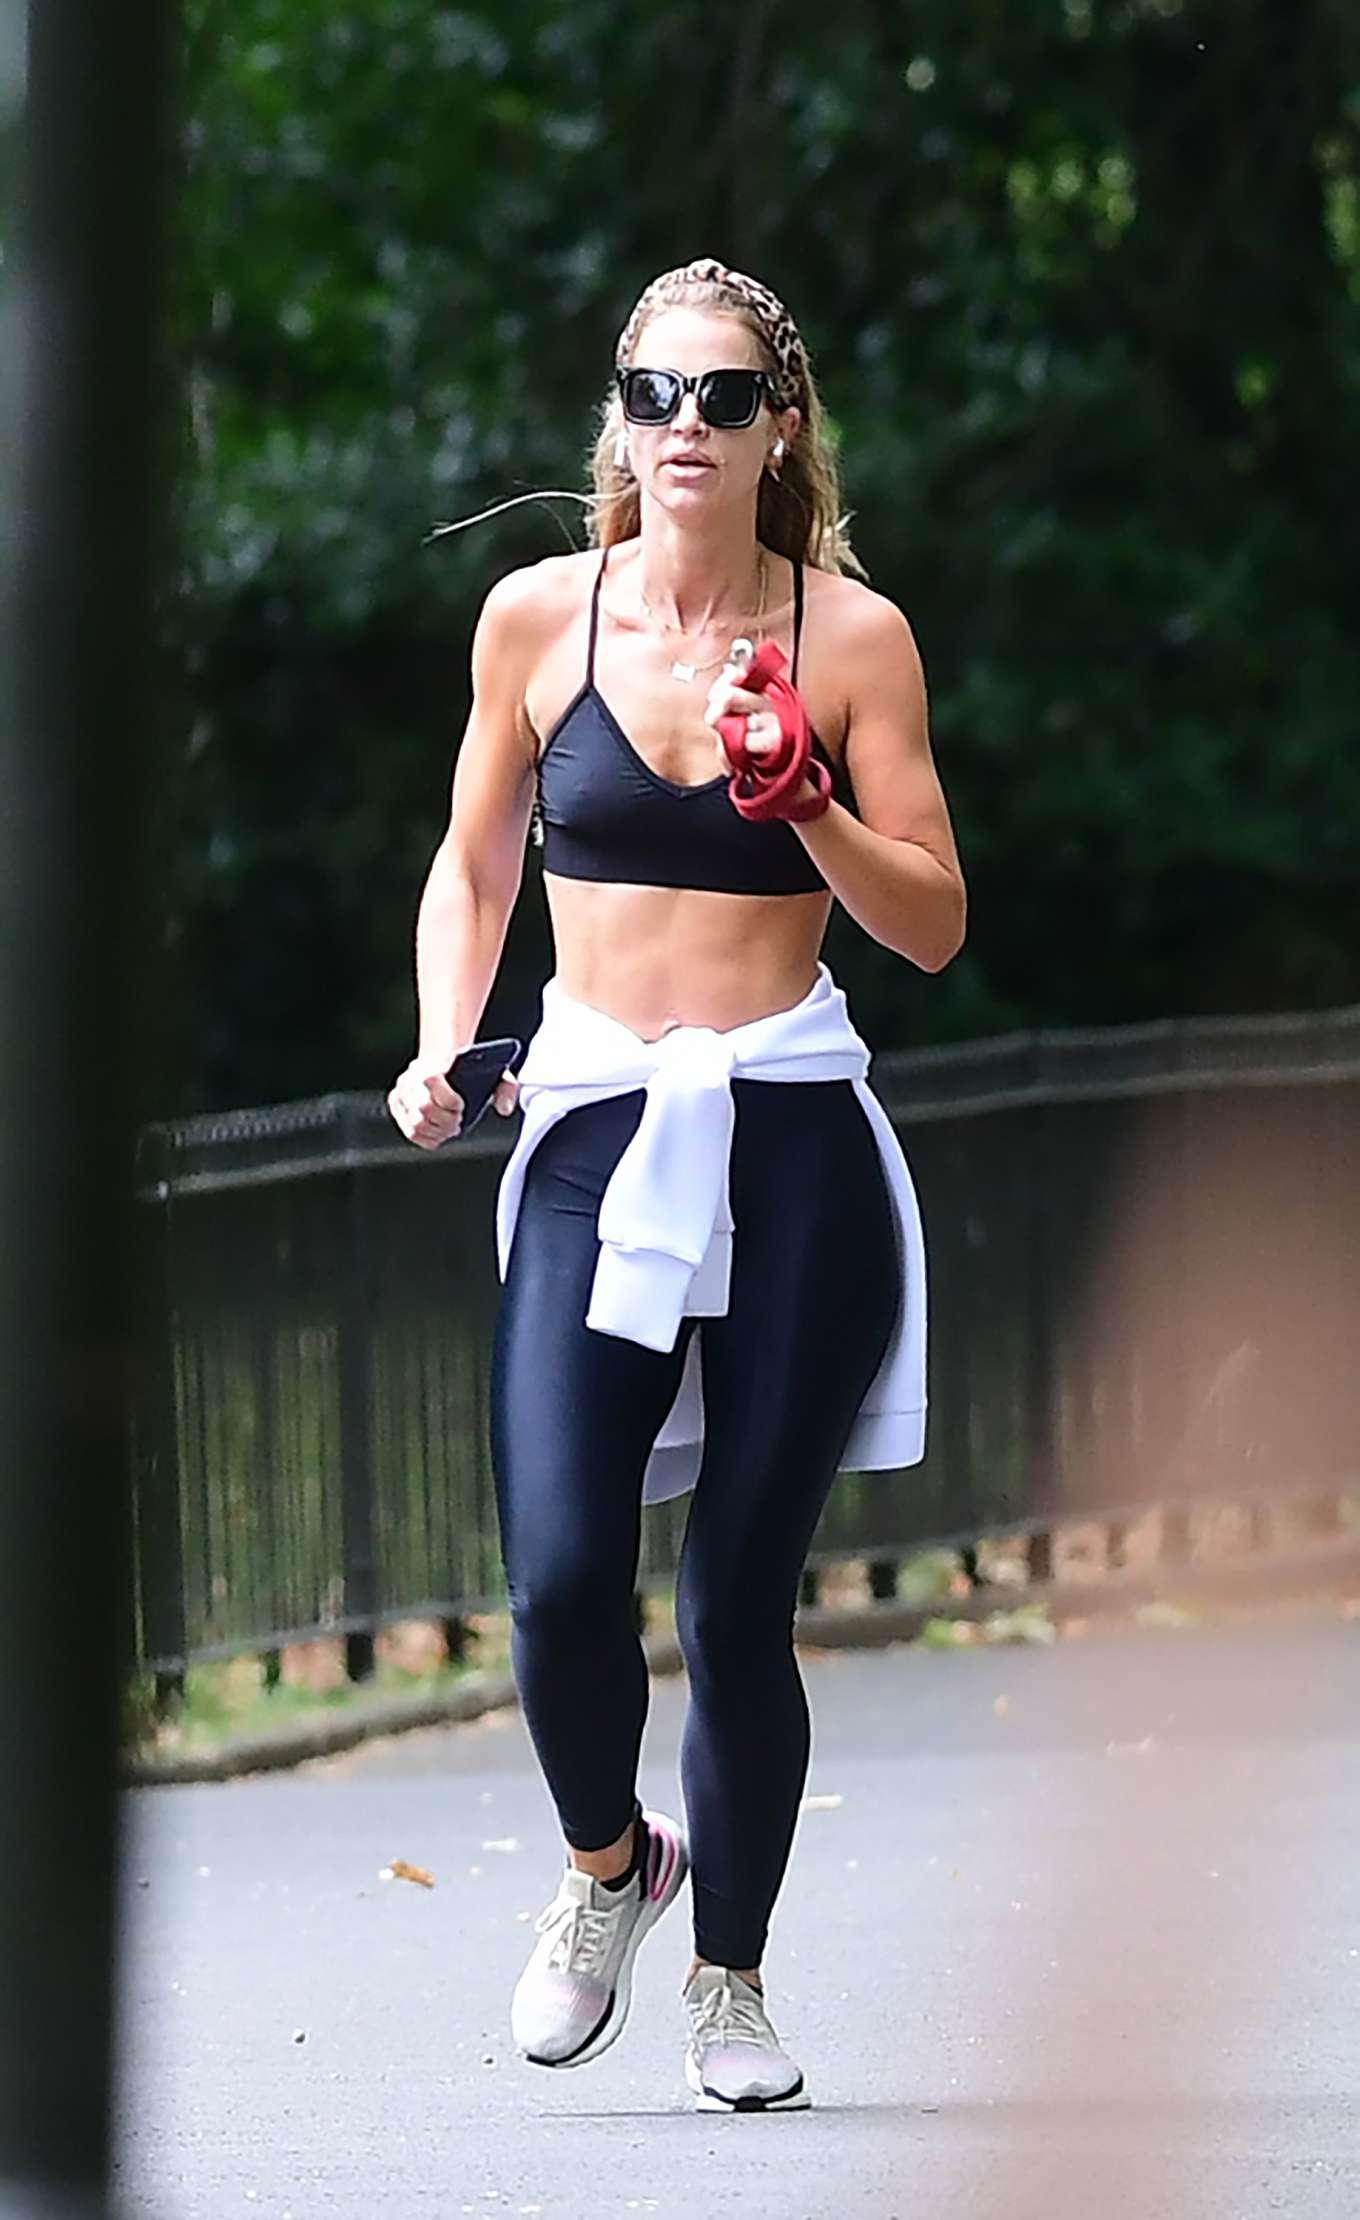 Vogue Williams - Jogging in London